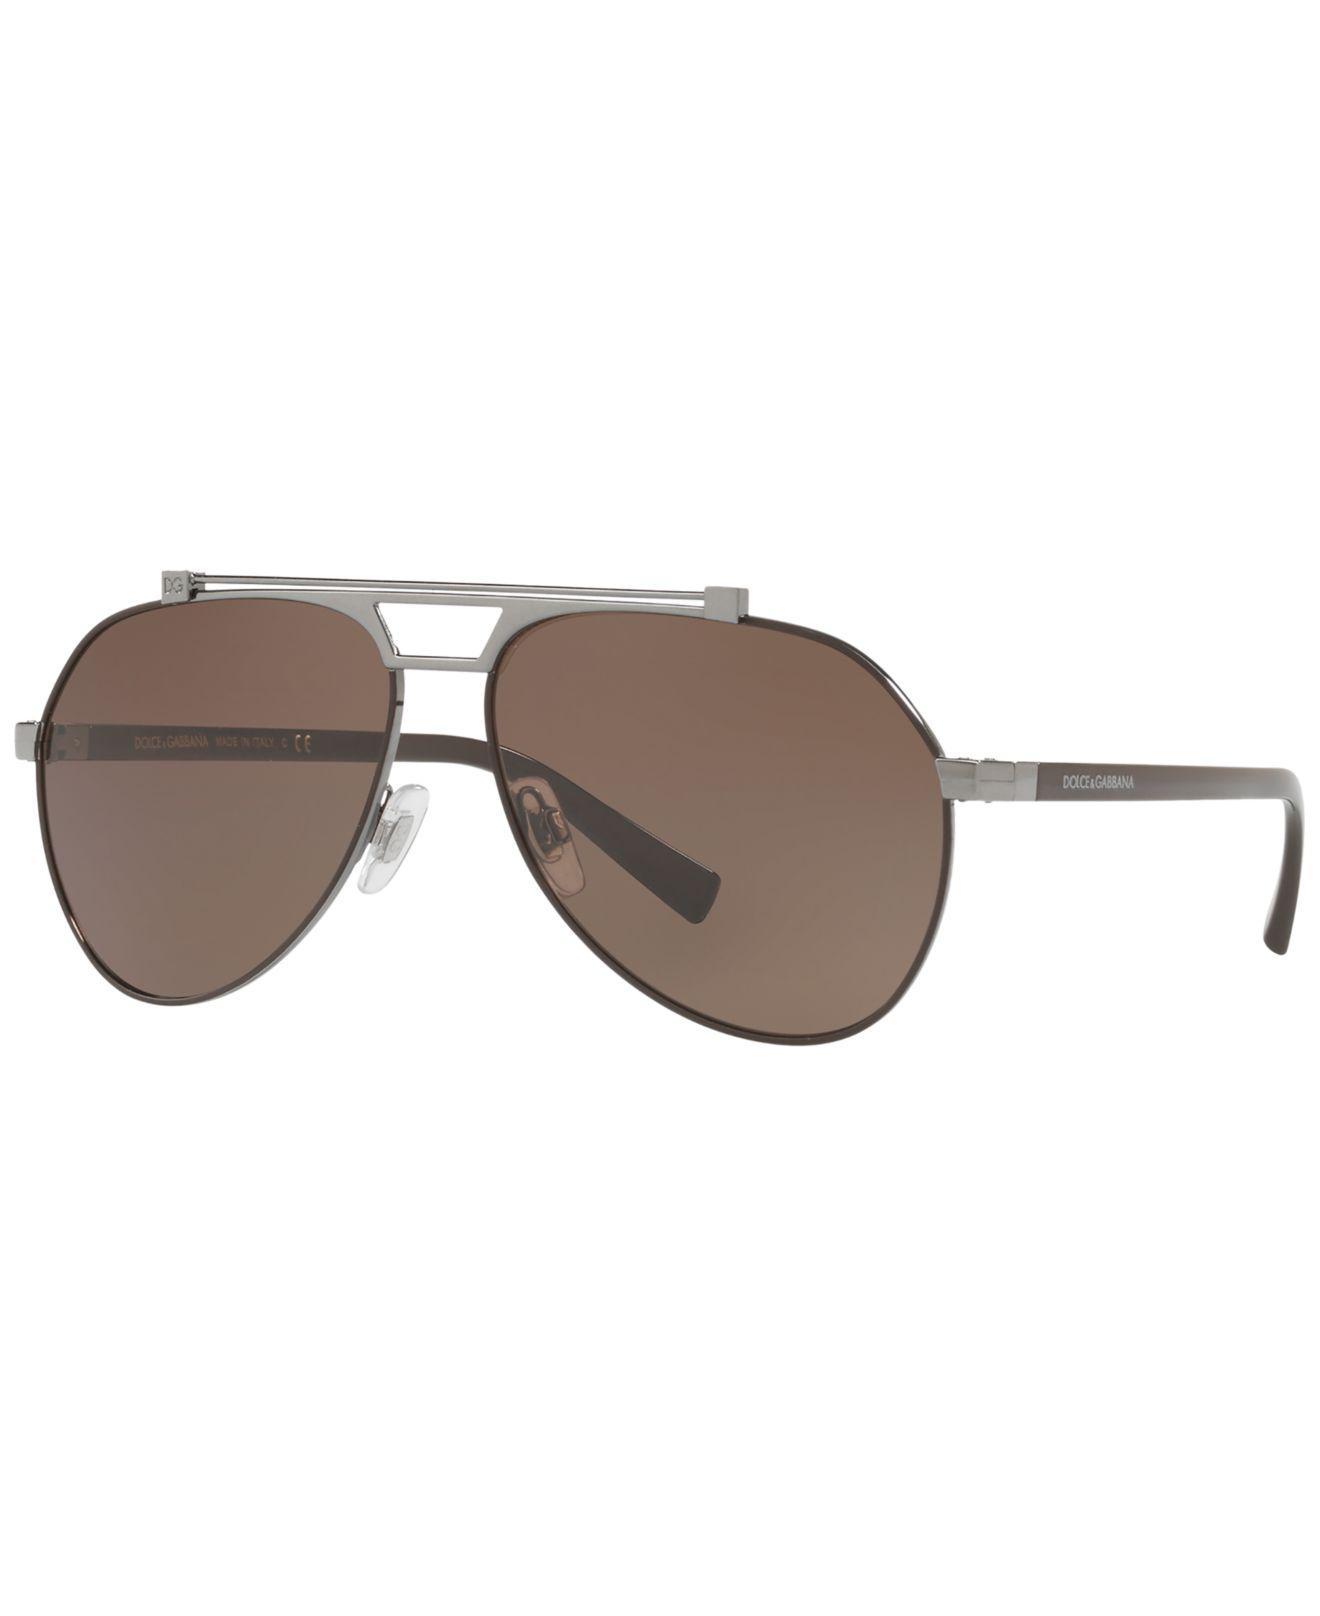 f778c4f0c77 Dolce   Gabbana. Men s Brown Sunglasses ...